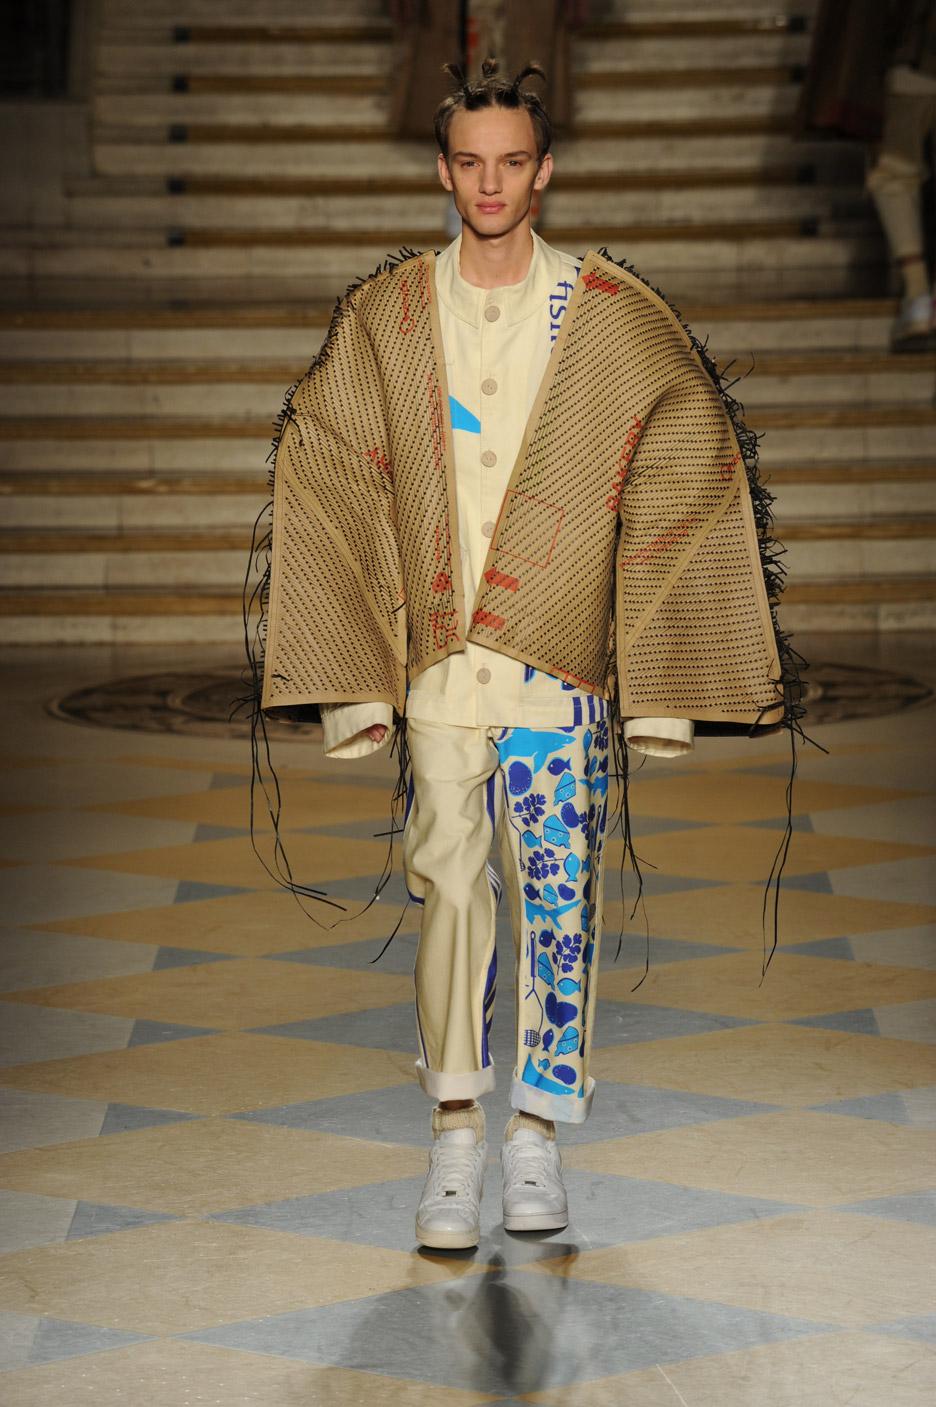 London College of Fashion MA16 Menswear Show